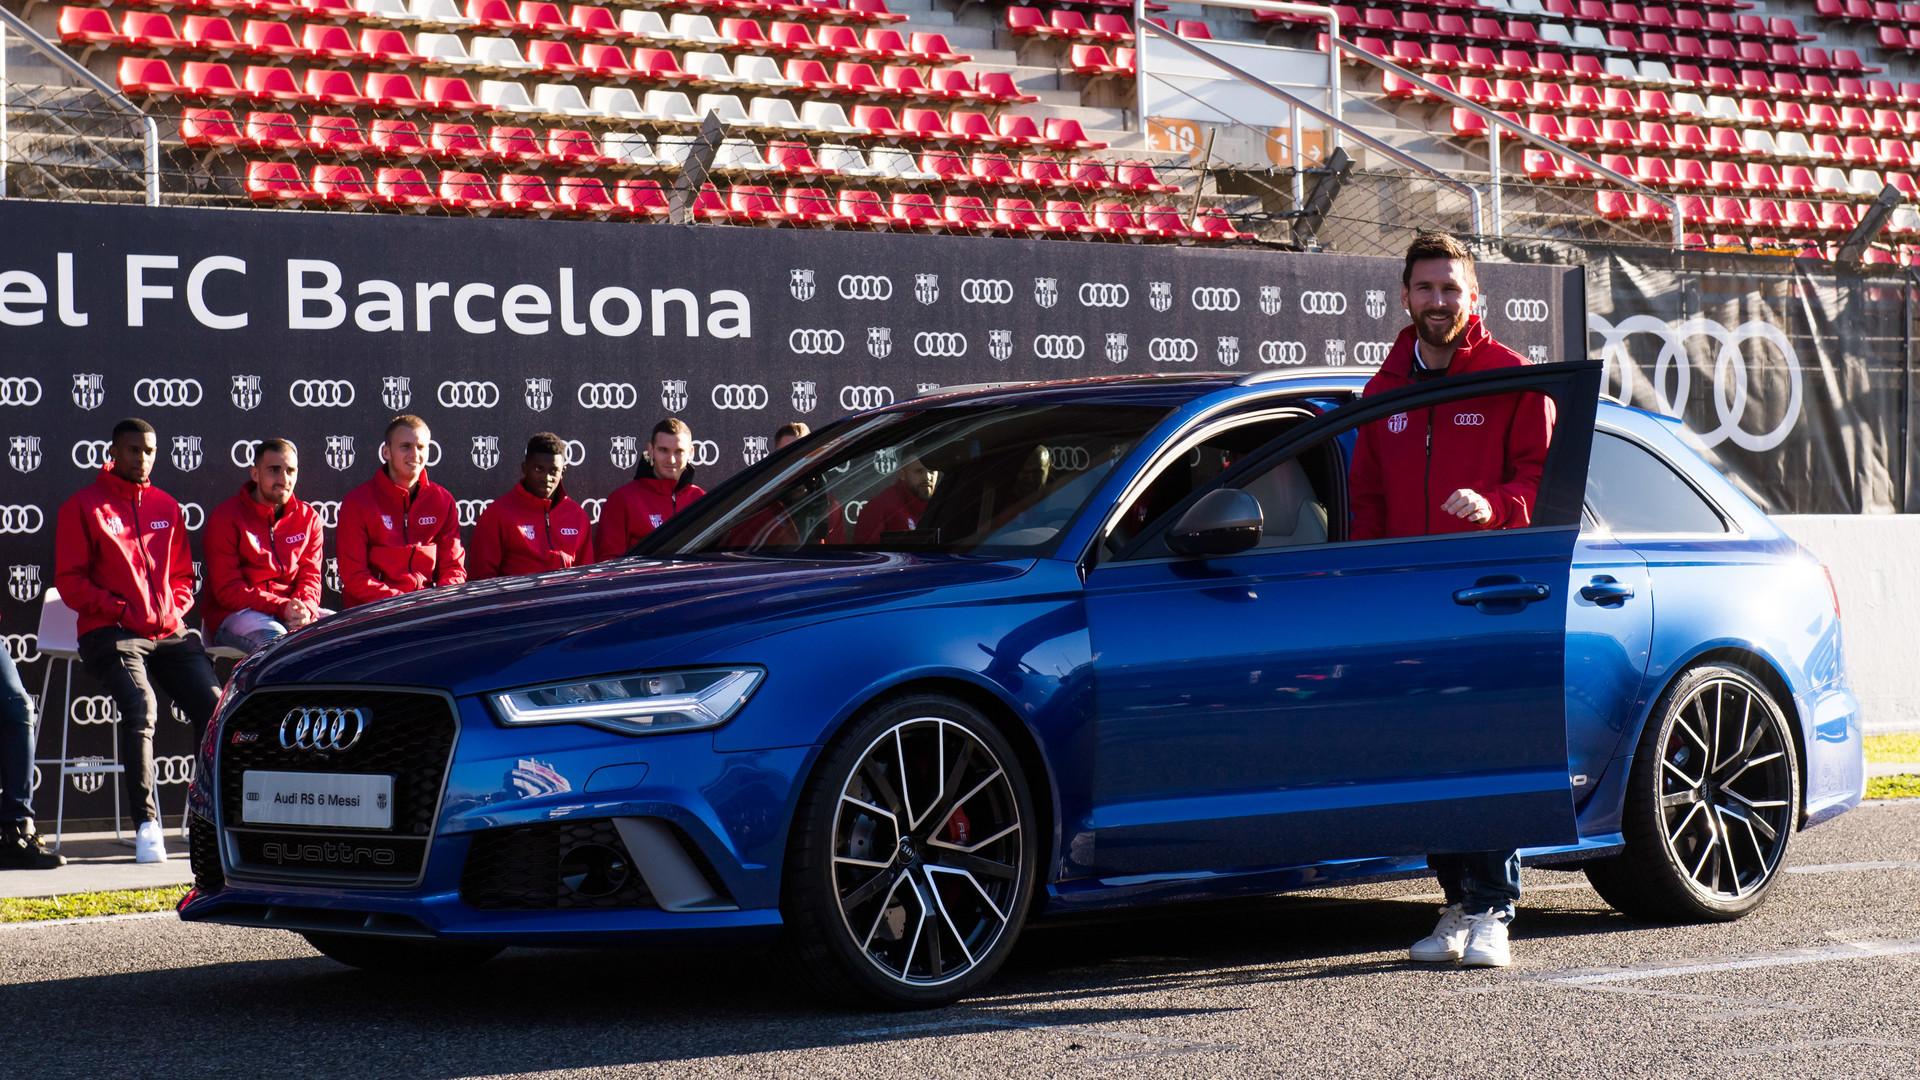 FC Barcelona Audi Car Handover 2017 Footage